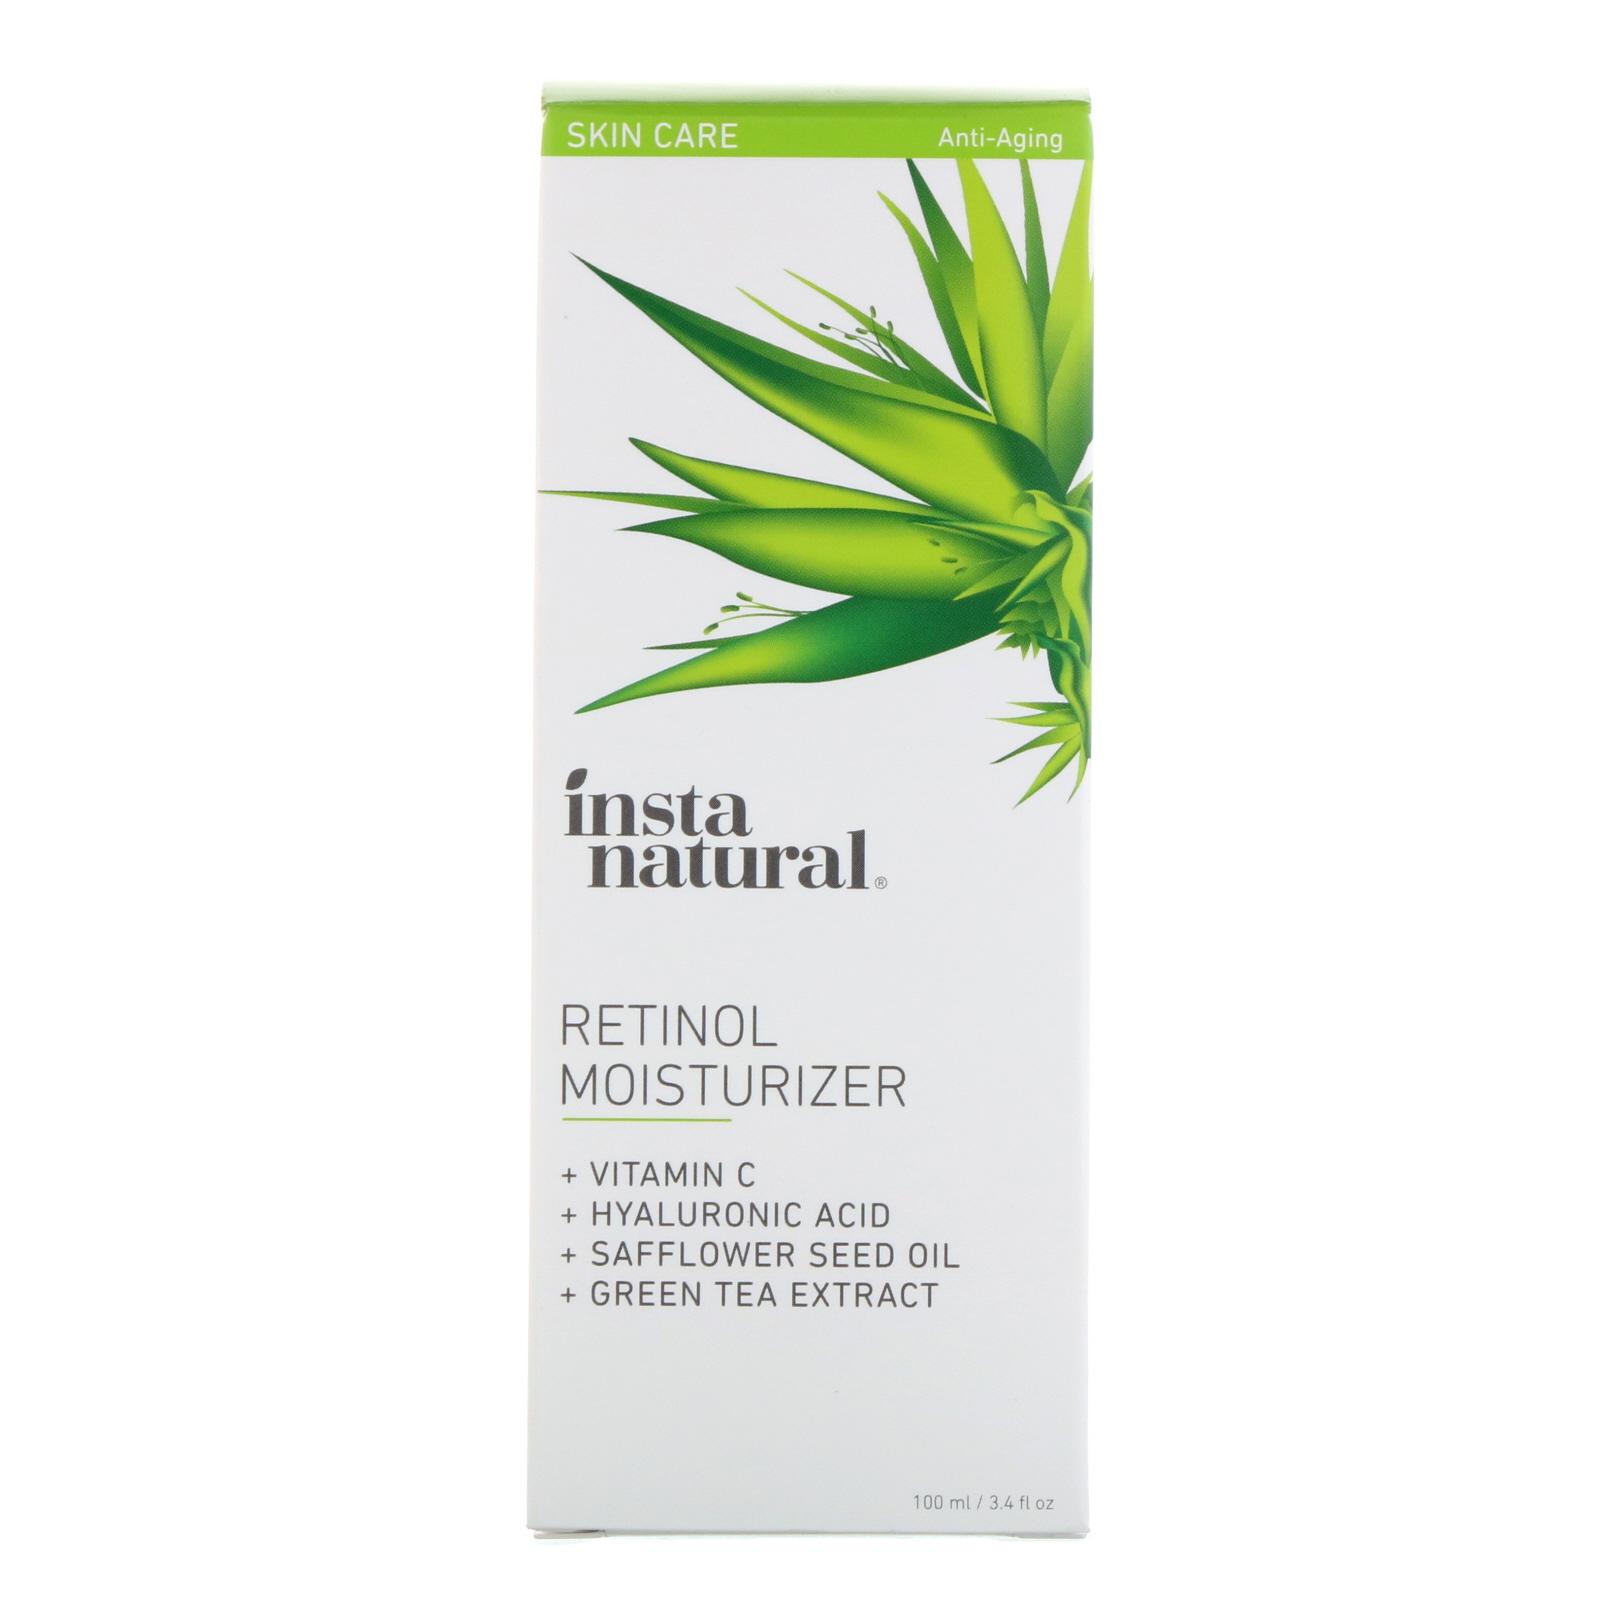 8e41d1c8821 InstaNatural, Retinol Moisturizer, Anti-Aging, 3.4 fl oz (100 ml ...